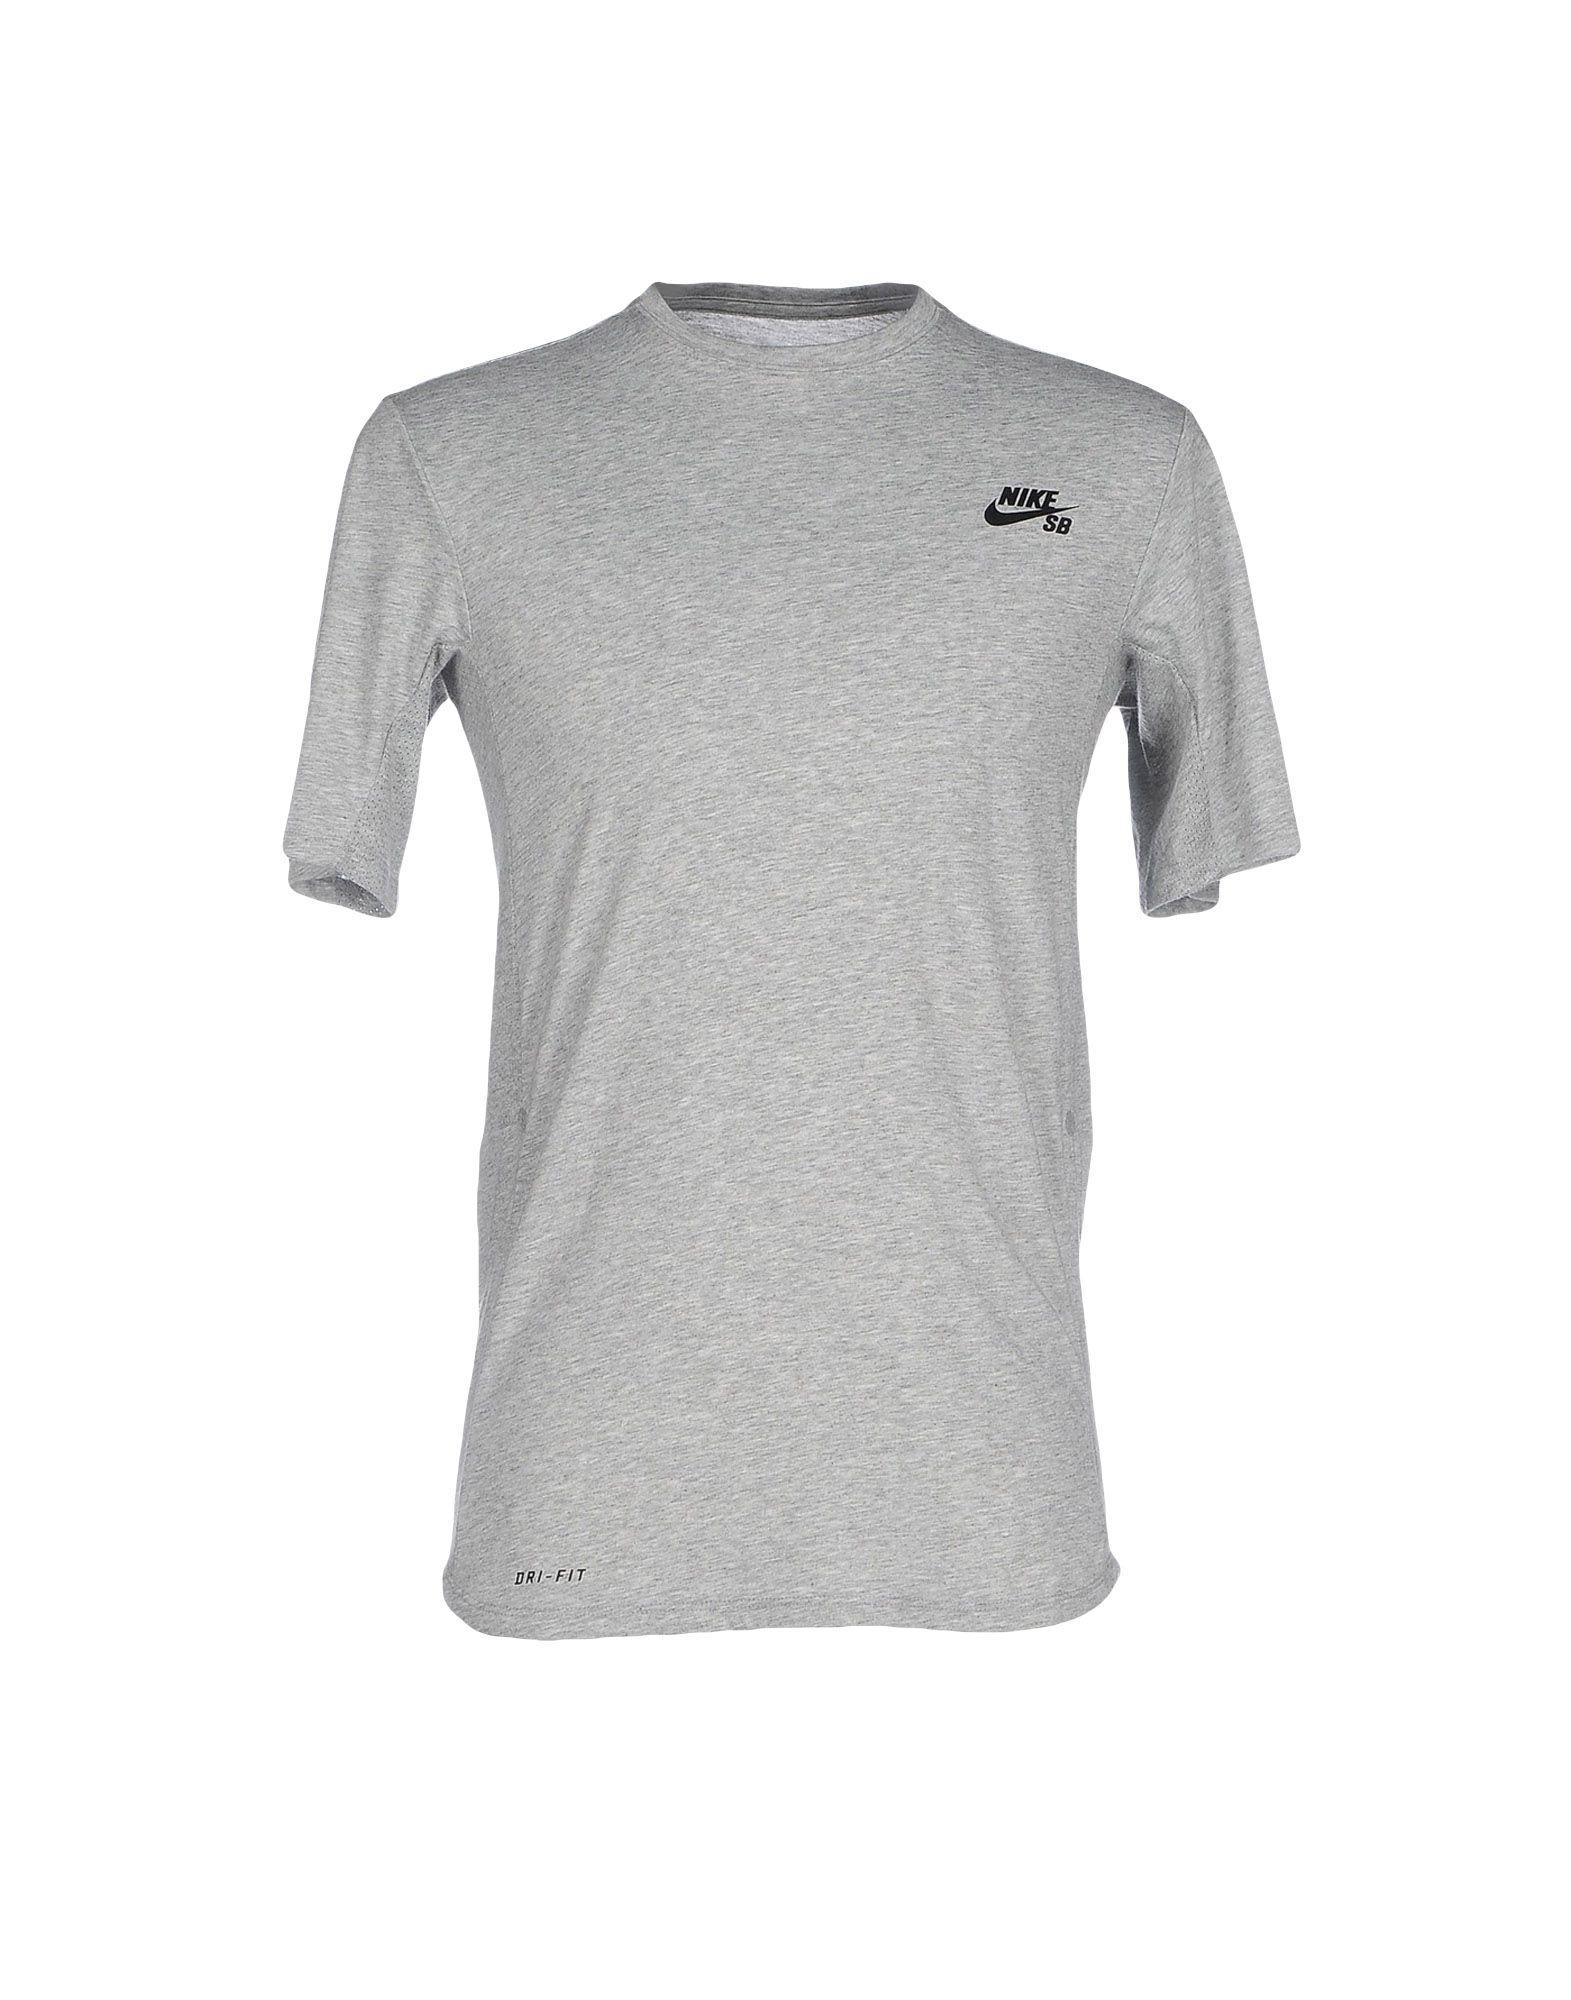 Nike T - shirts